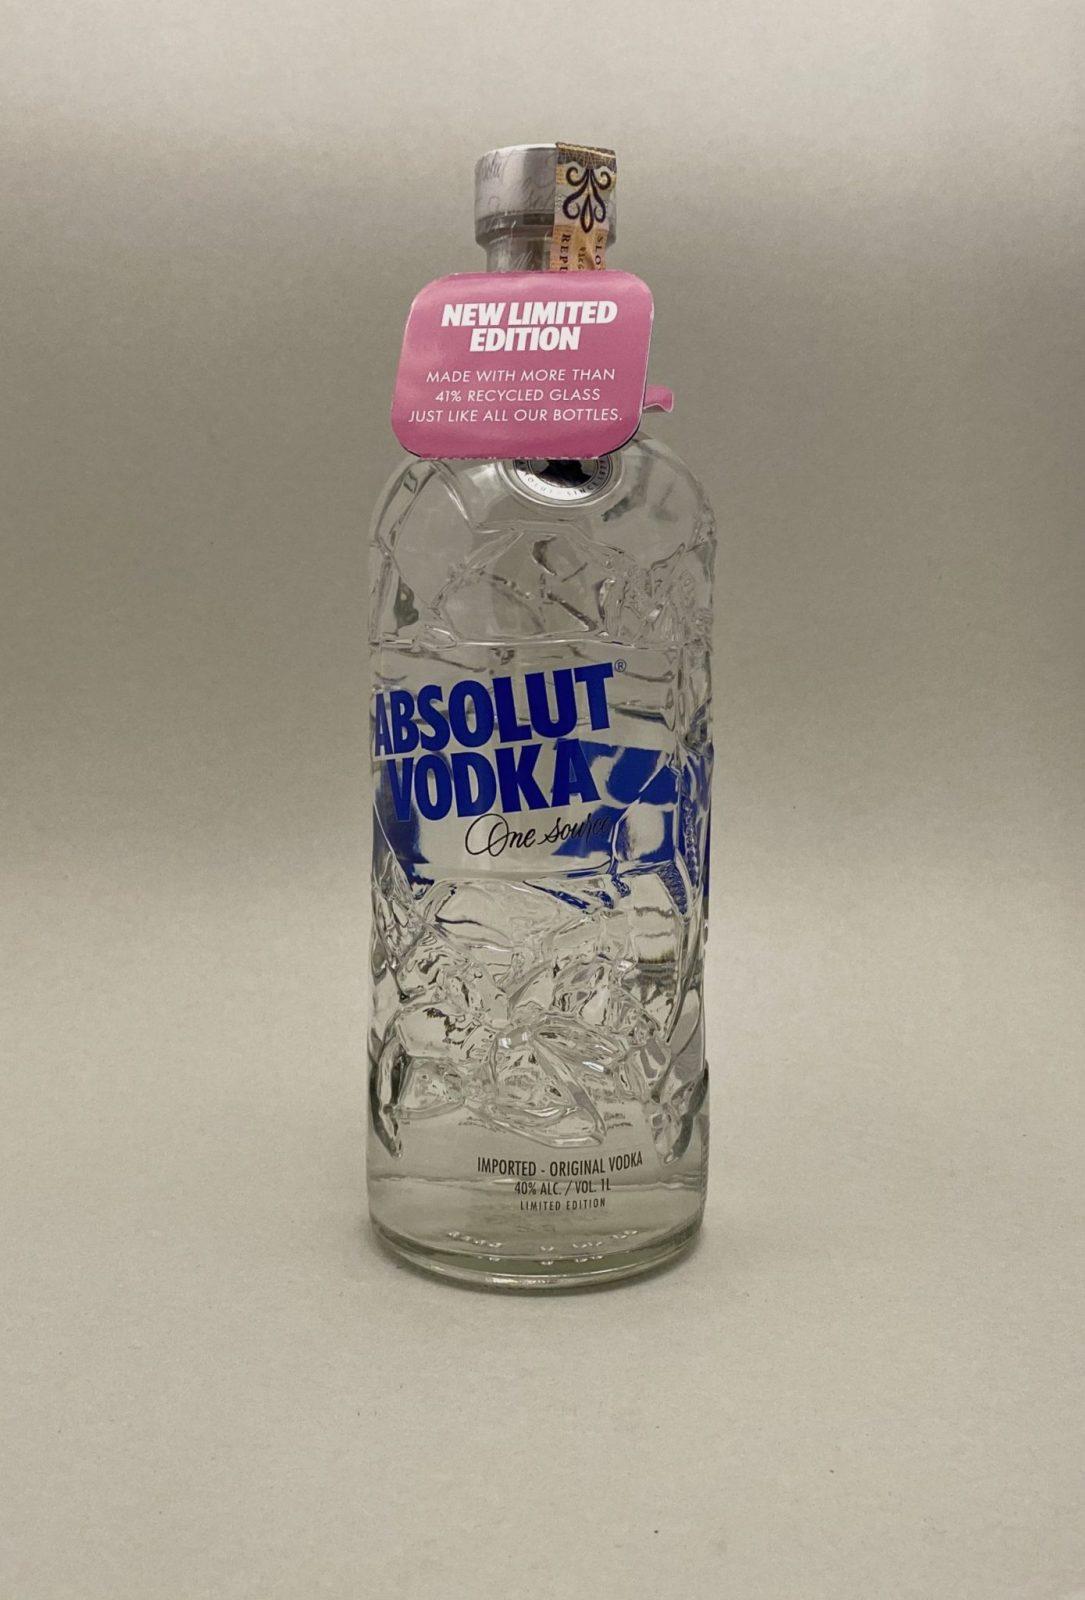 Absolut Comeback 40%, Bottleshop Sunny wines slnecnice mesto, petrzalka, Vodka, rozvoz alkoholu, eshop